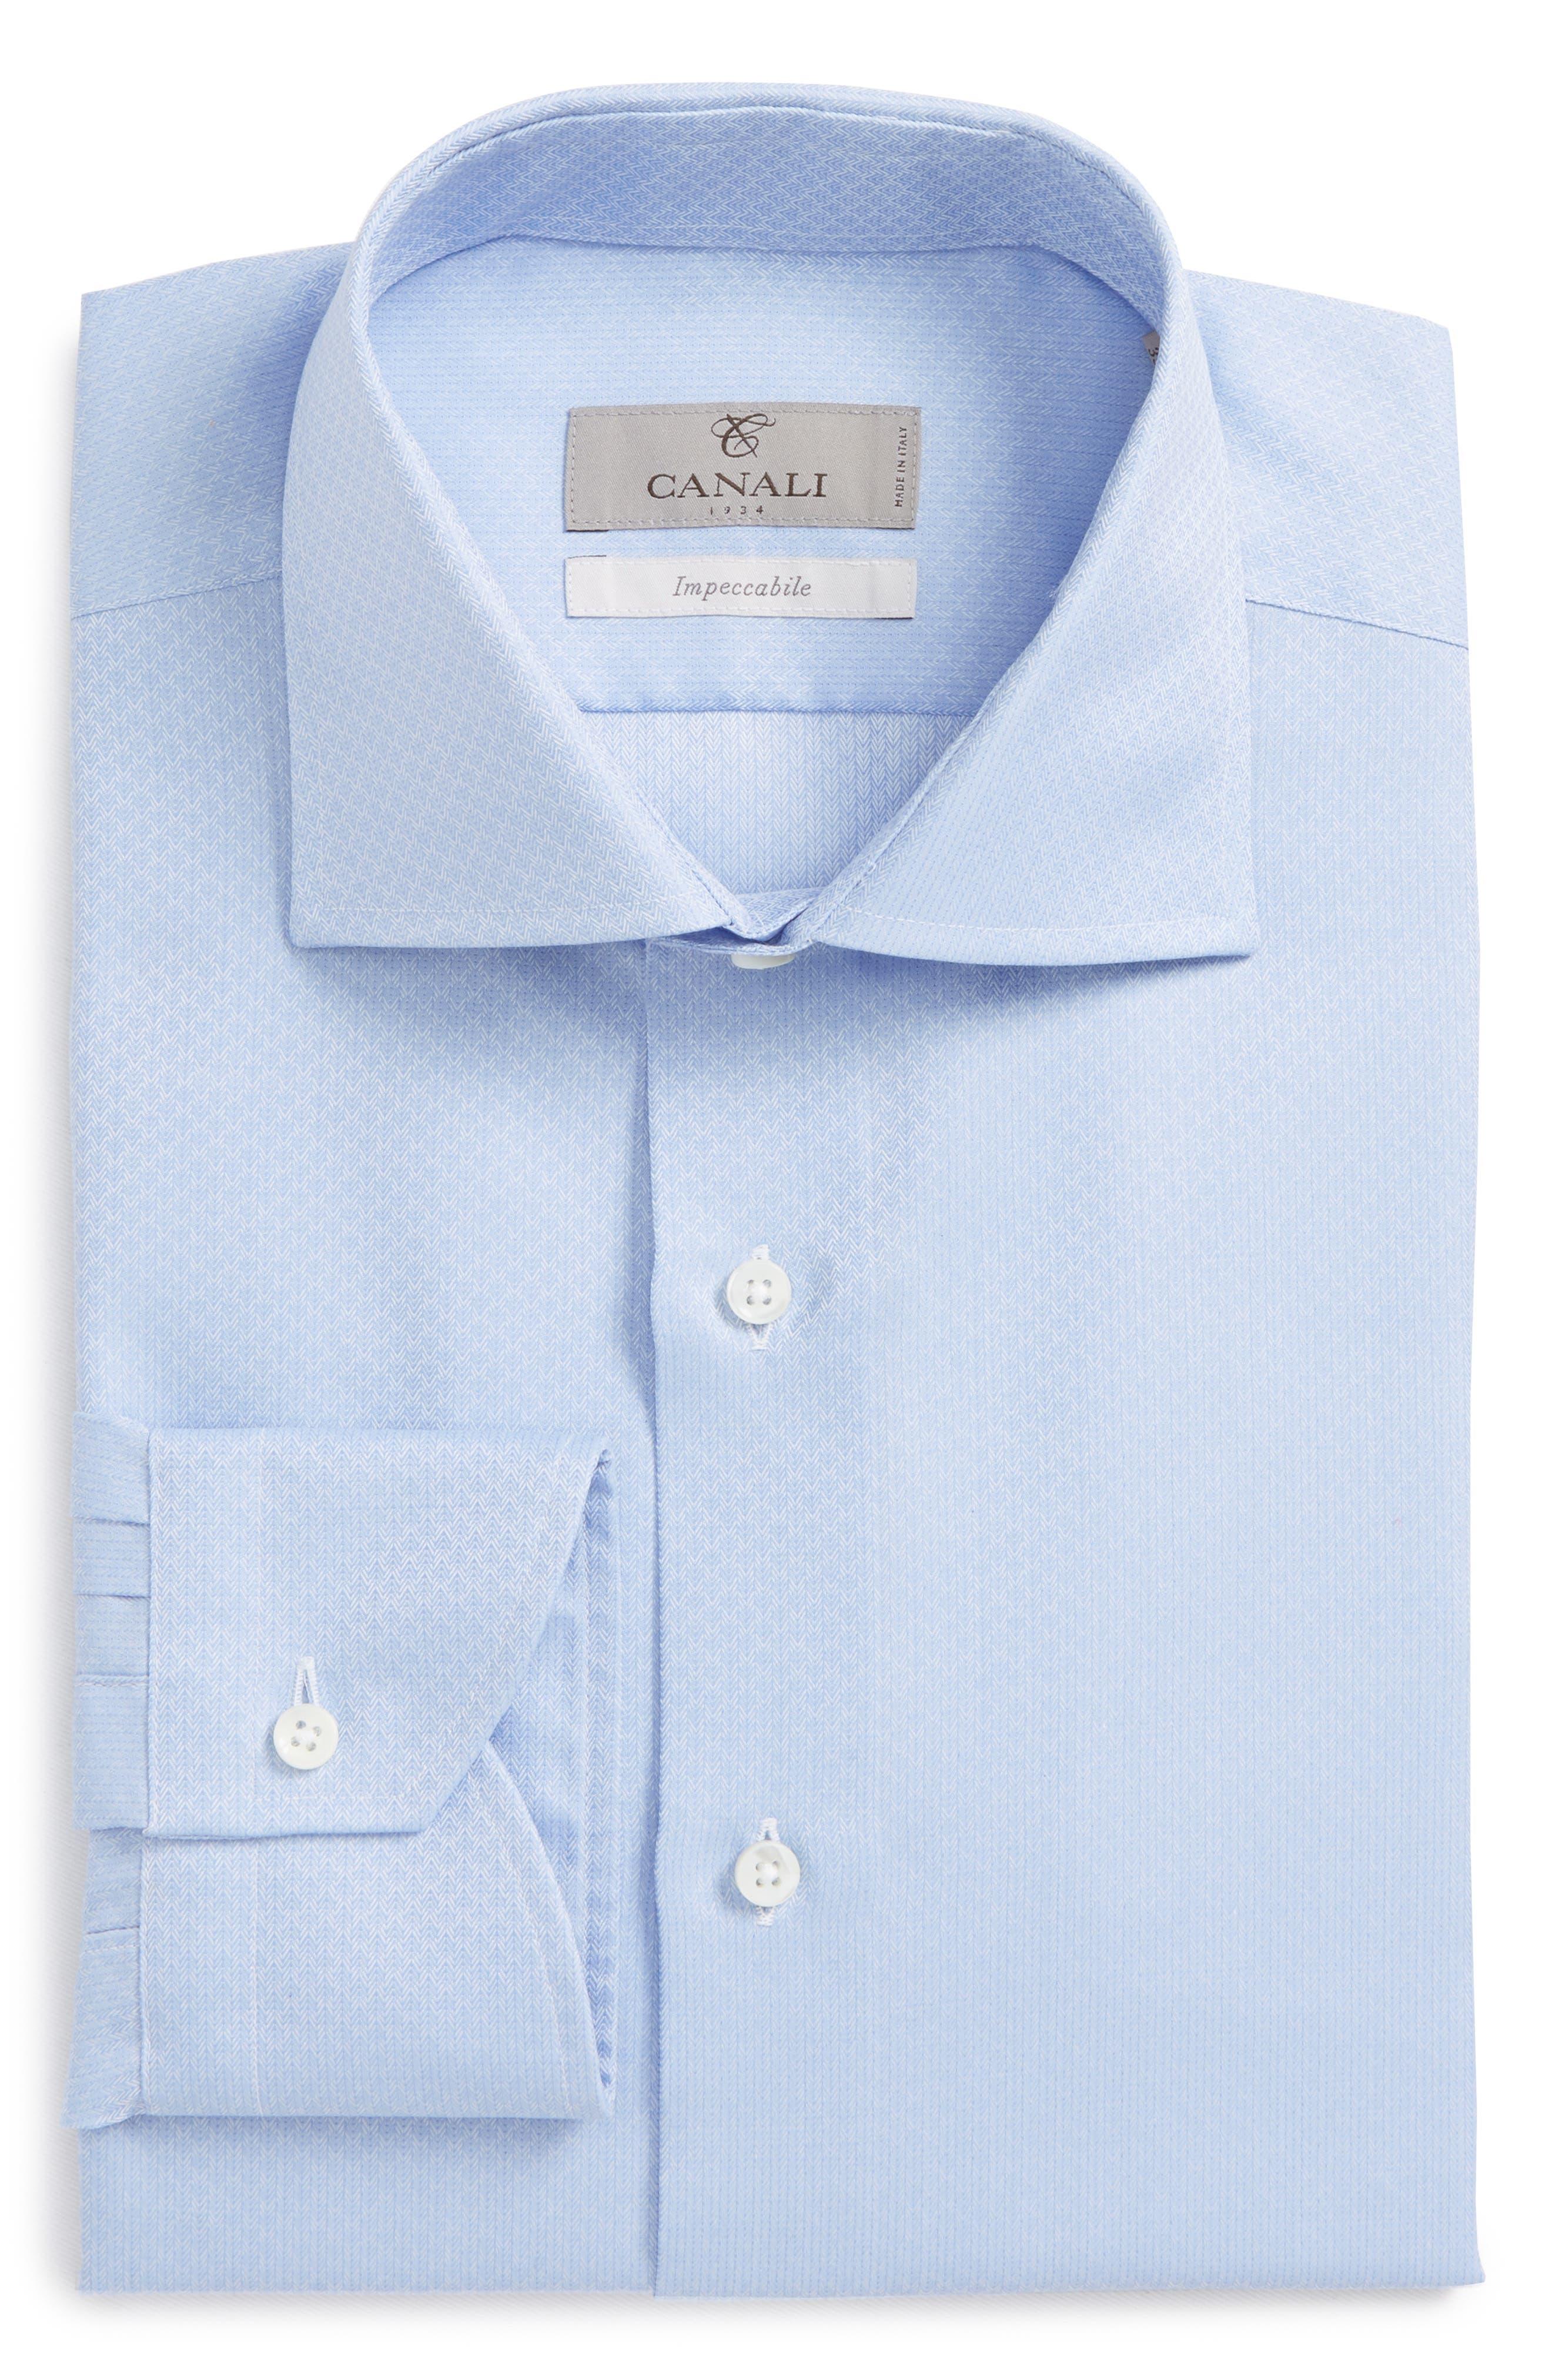 Regular Fit Herringbone Dress Shirt,                             Main thumbnail 1, color,                             420